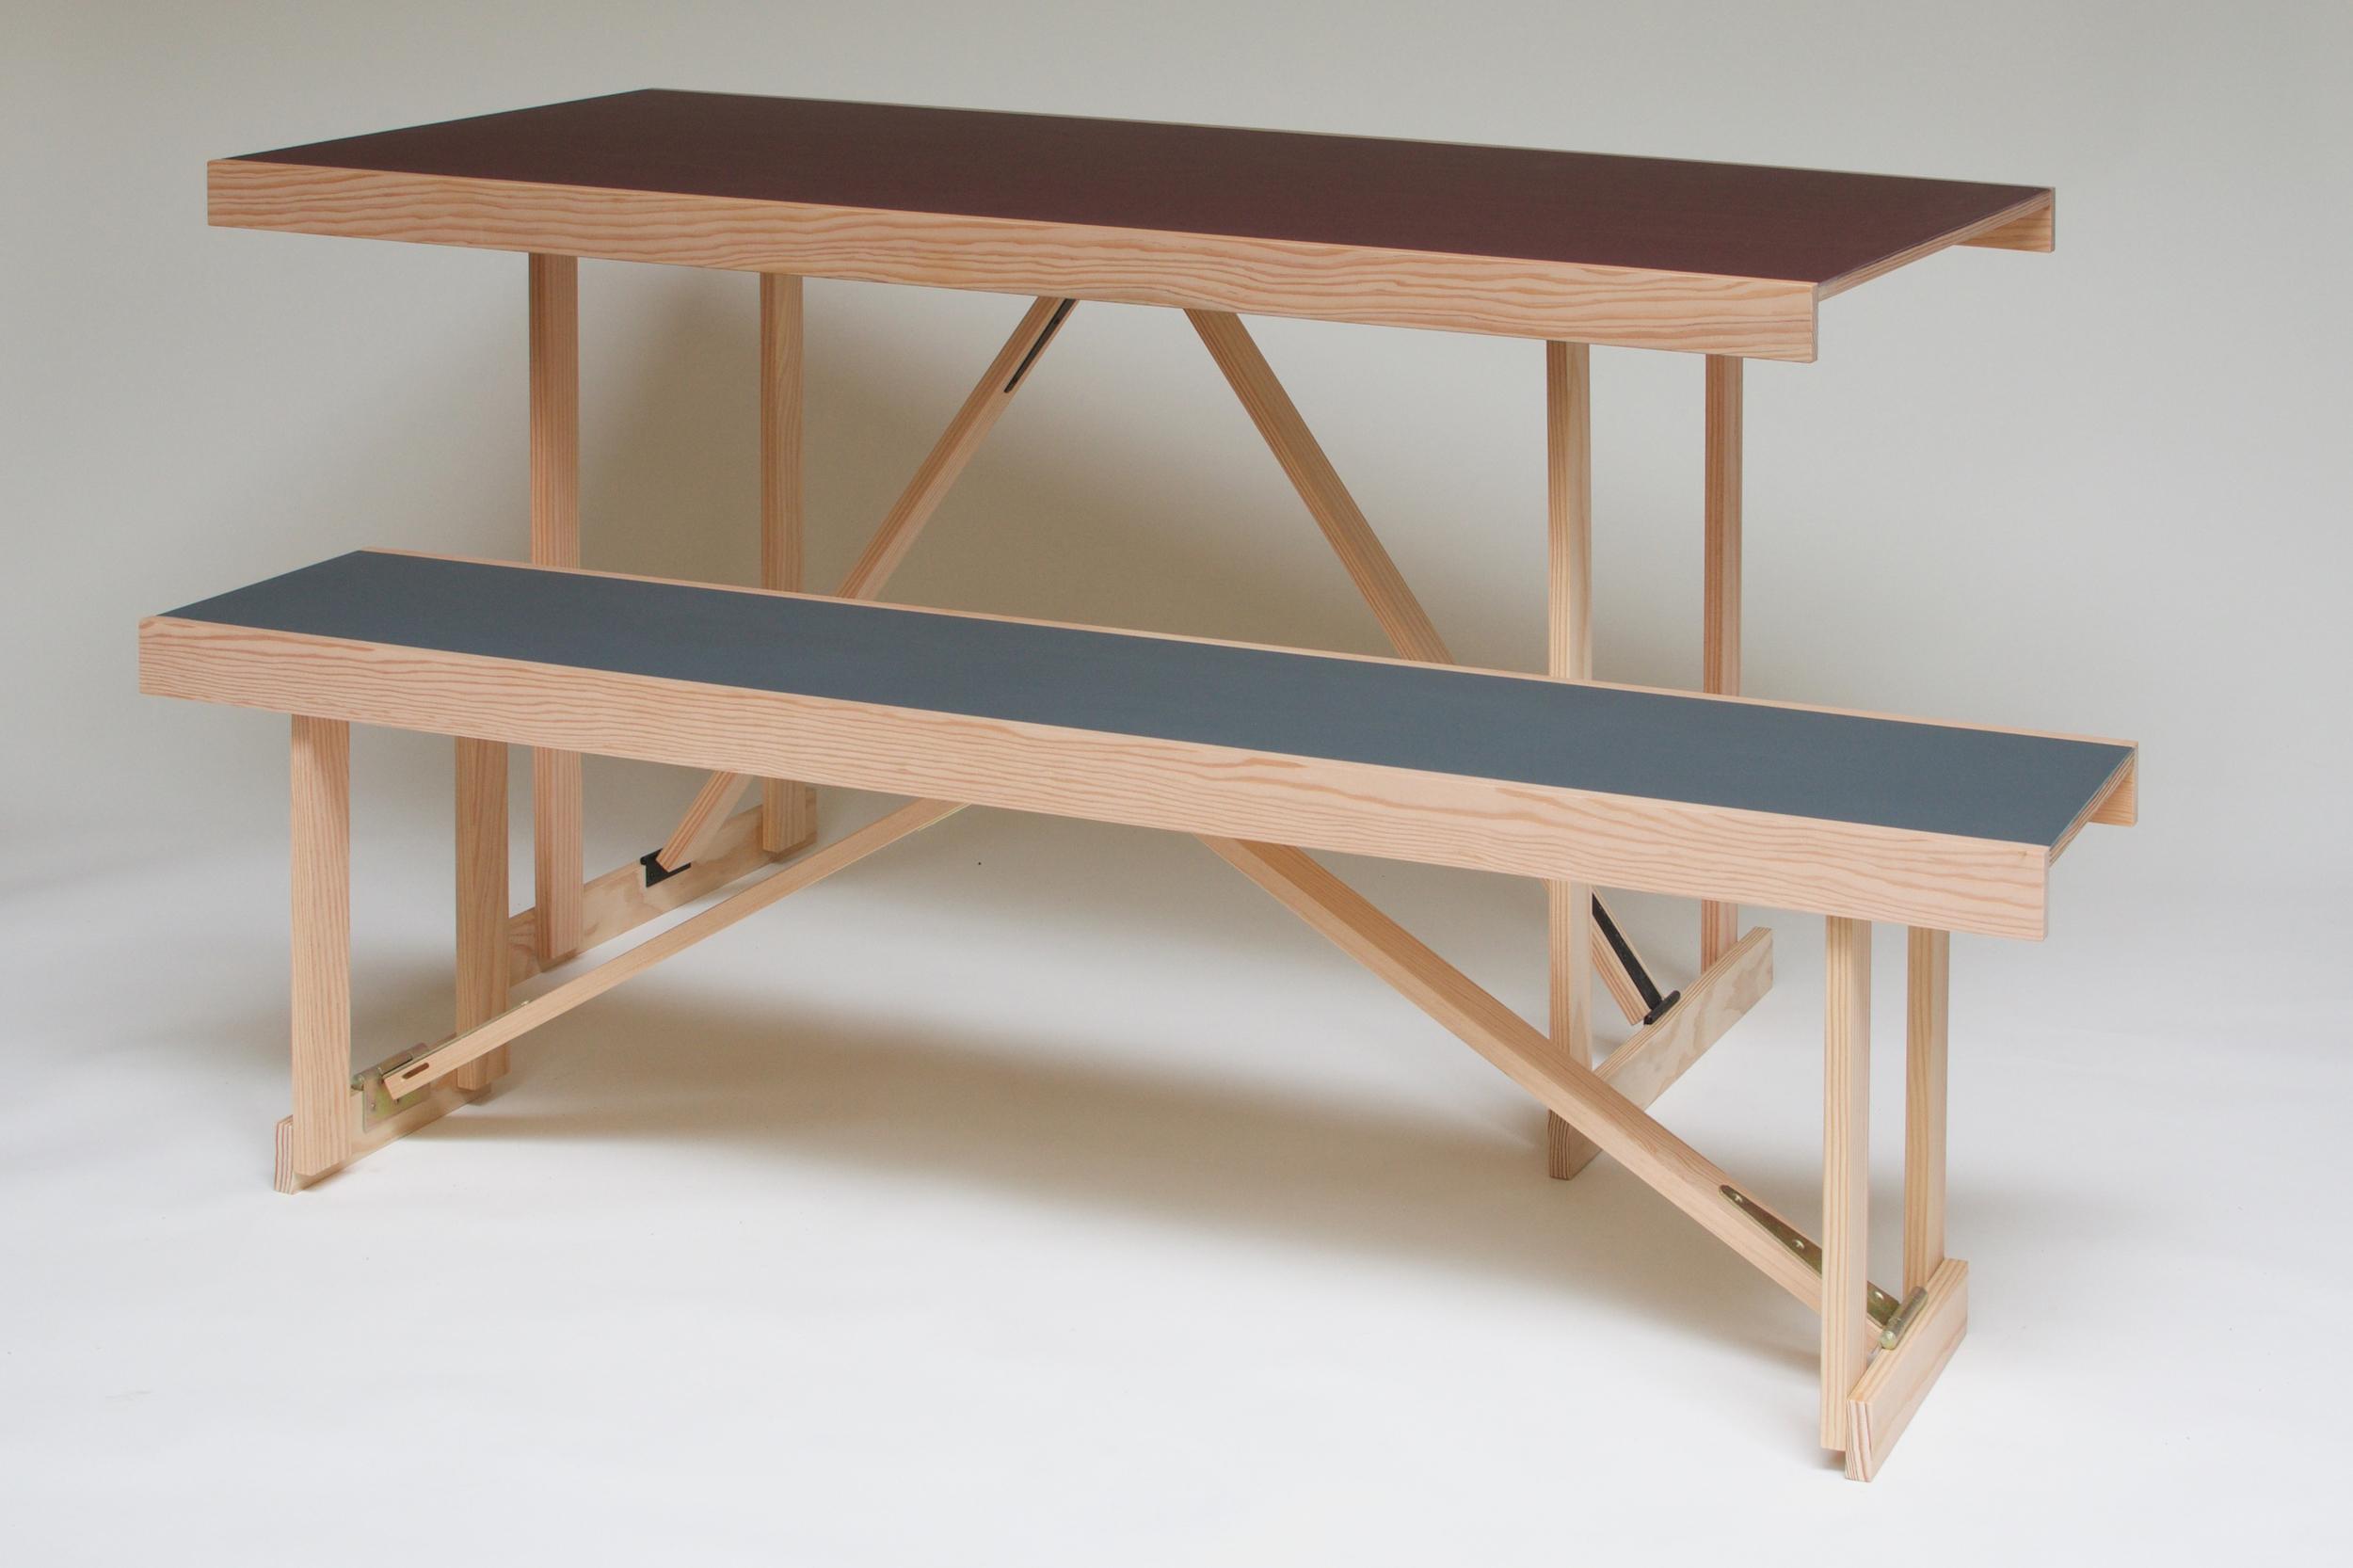 Lino Folding Table & Bench 1